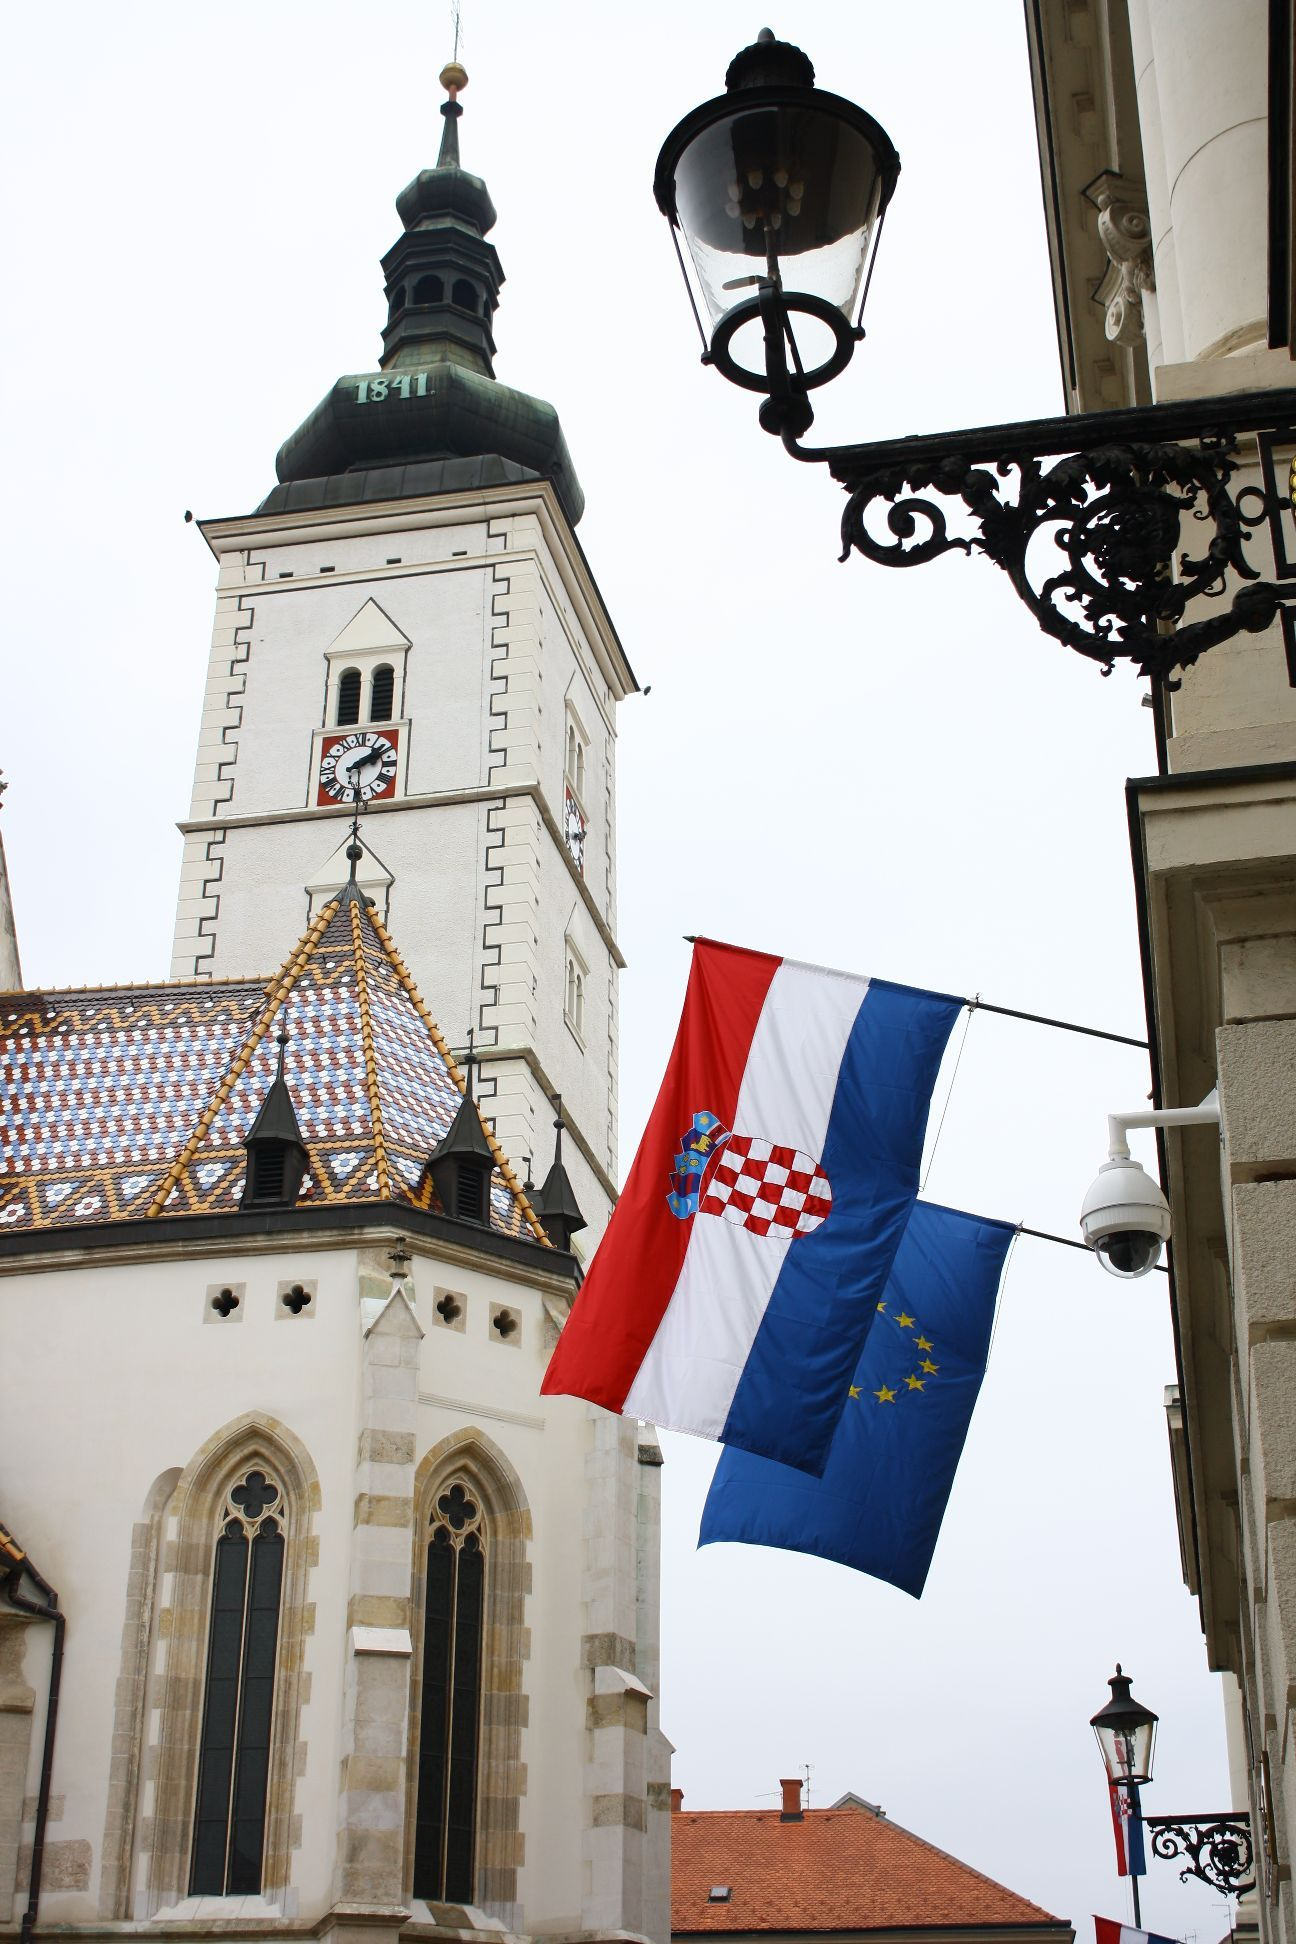 Markova Crkva Arts And Entertainment Central Europe Zagreb Croatia